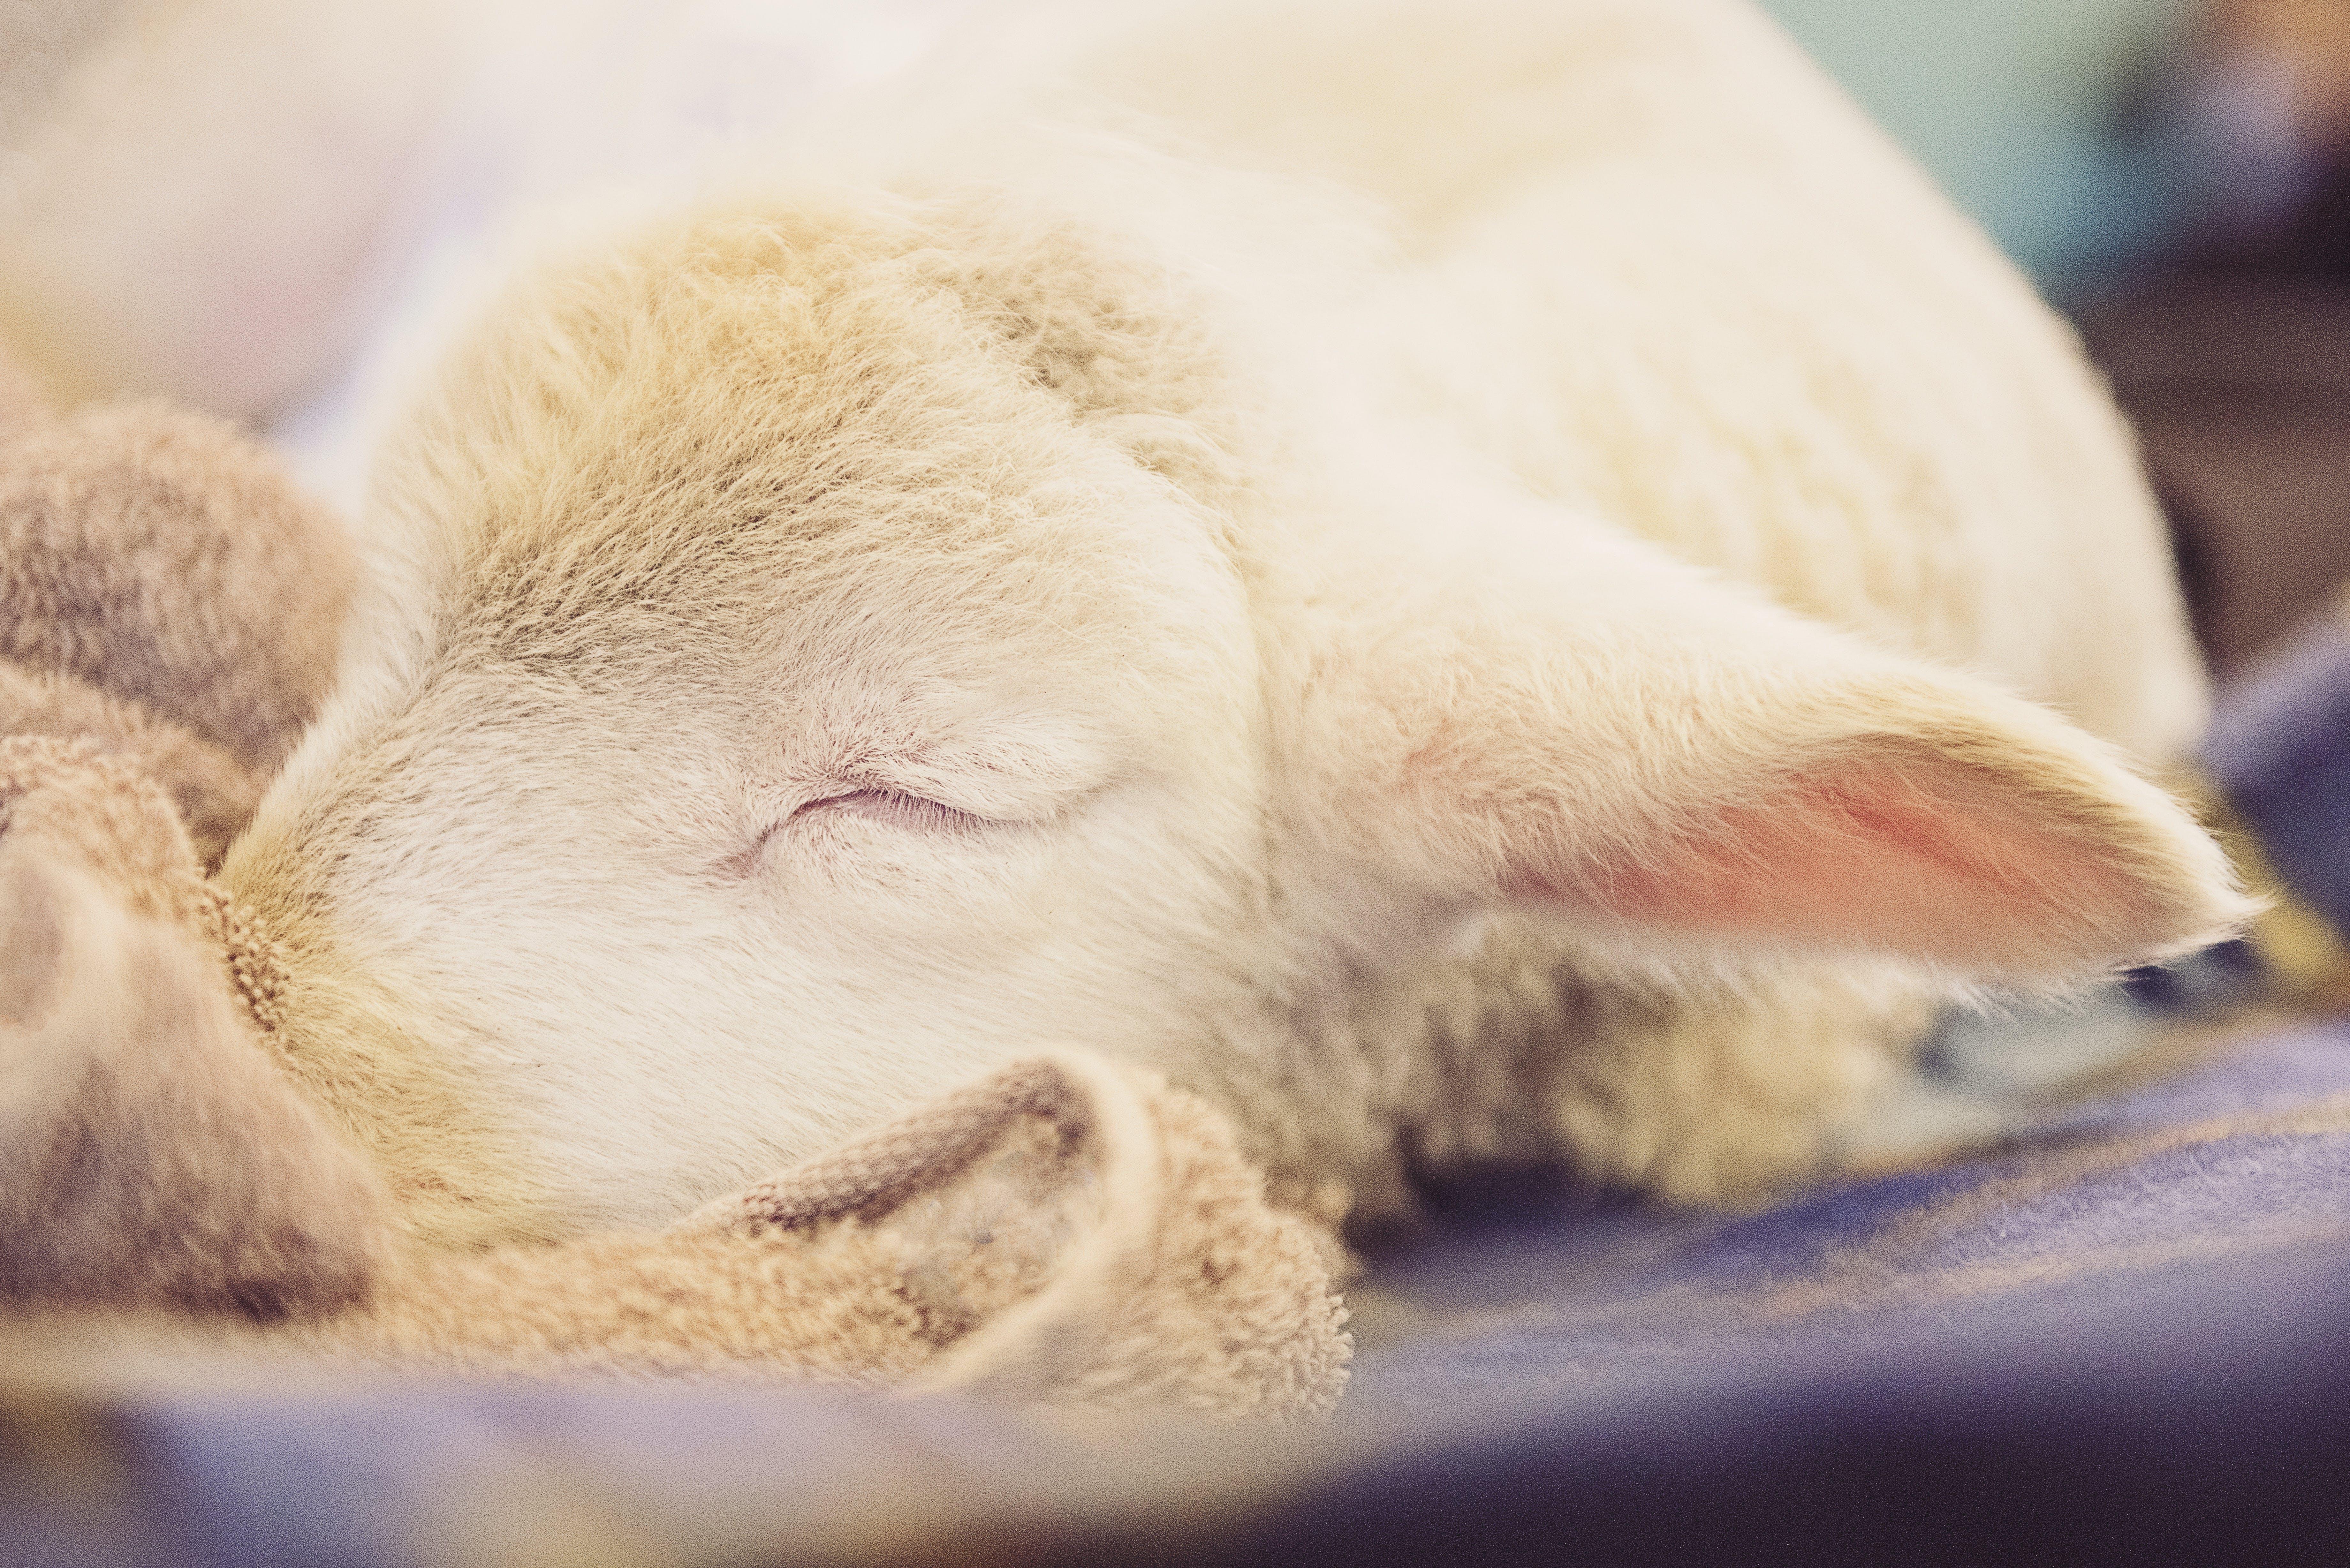 Free stock photo of face, eye, sheep, sleeping